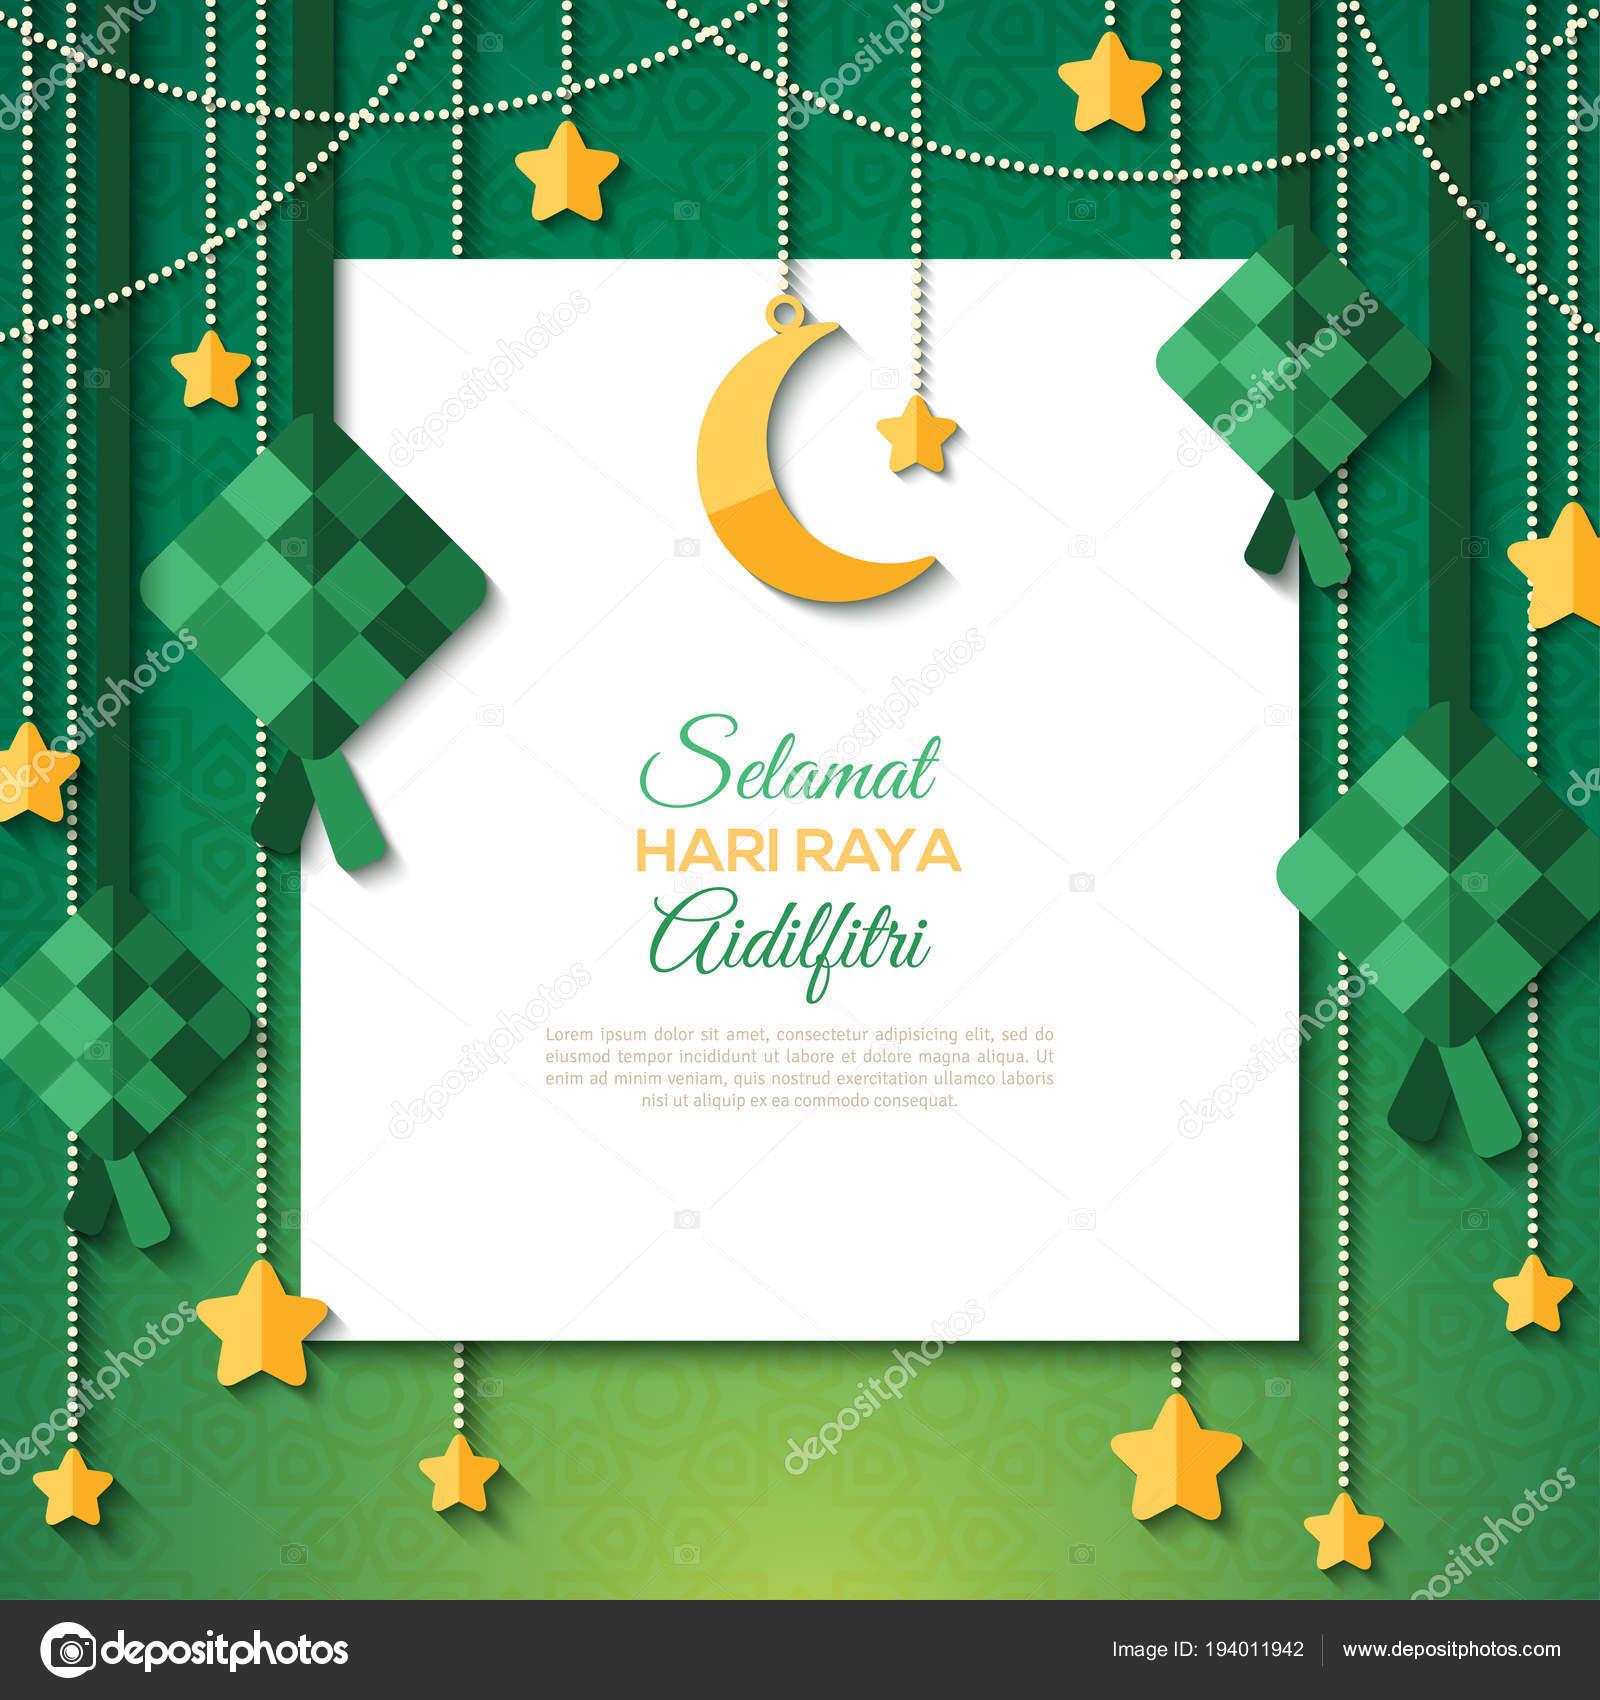 Selamat Hari Raya Card With White Paper Sheet